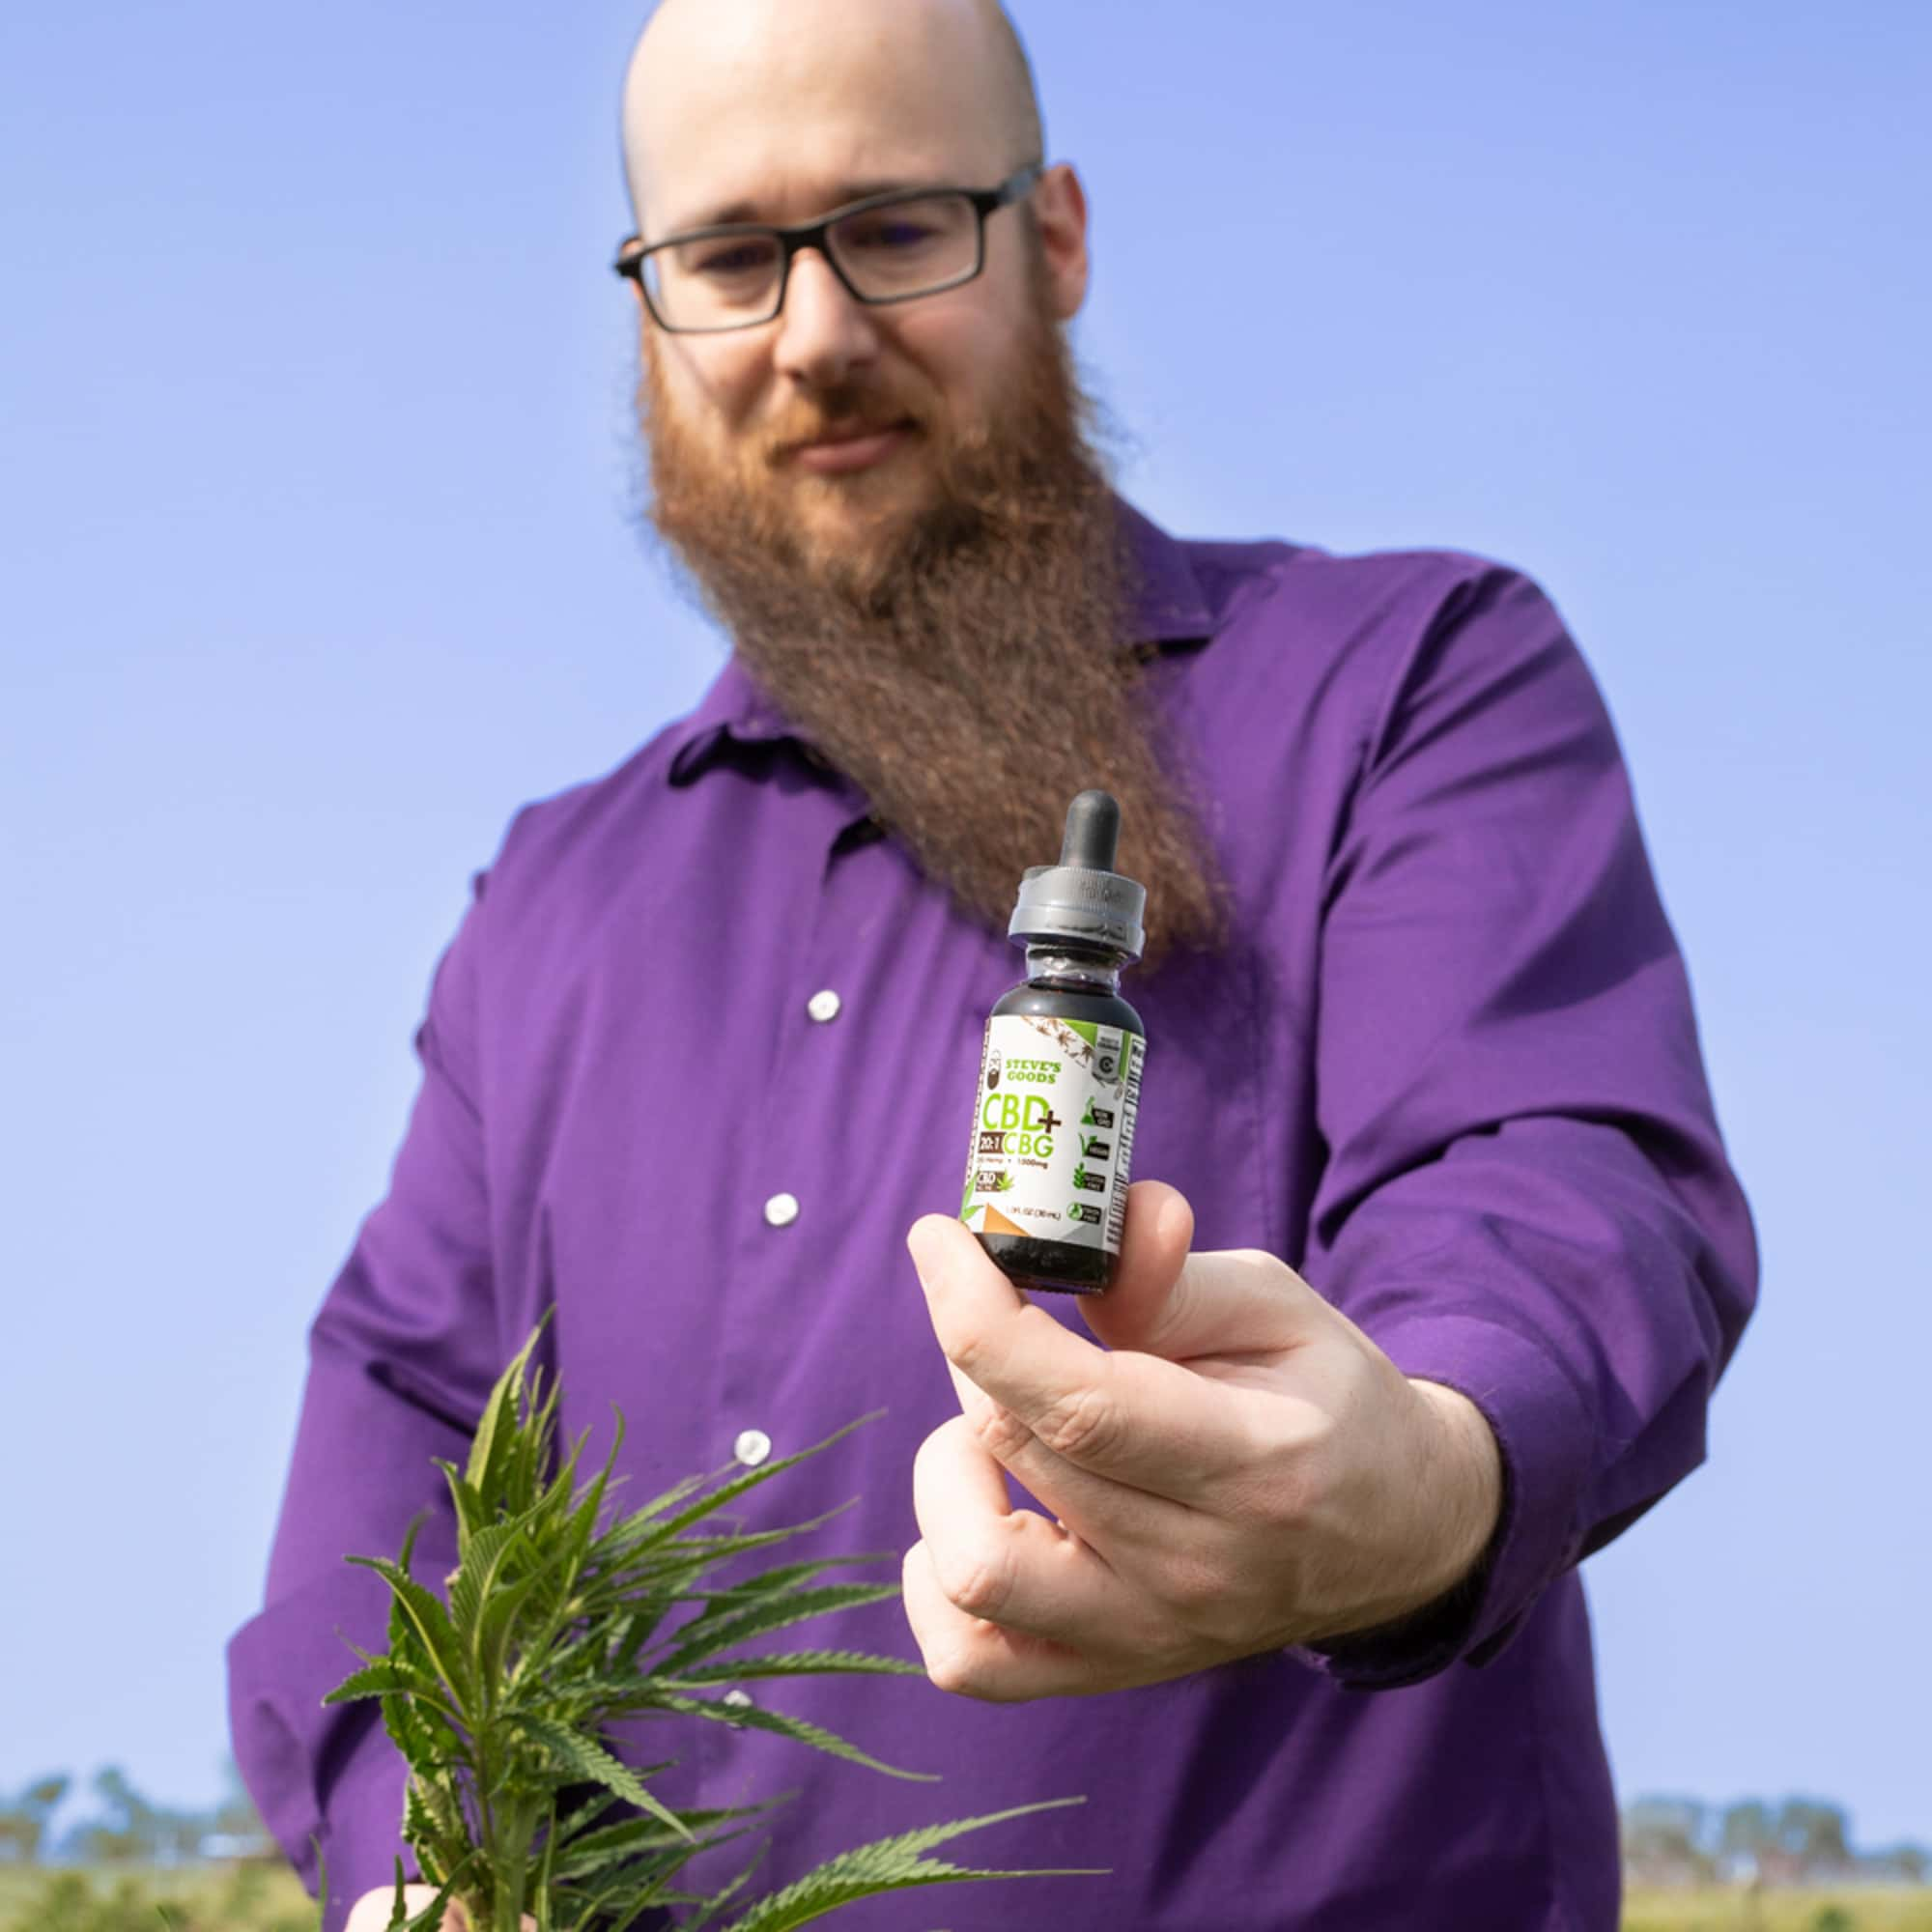 steve-at-steve's-hemp-farm-holding-cbg-oil